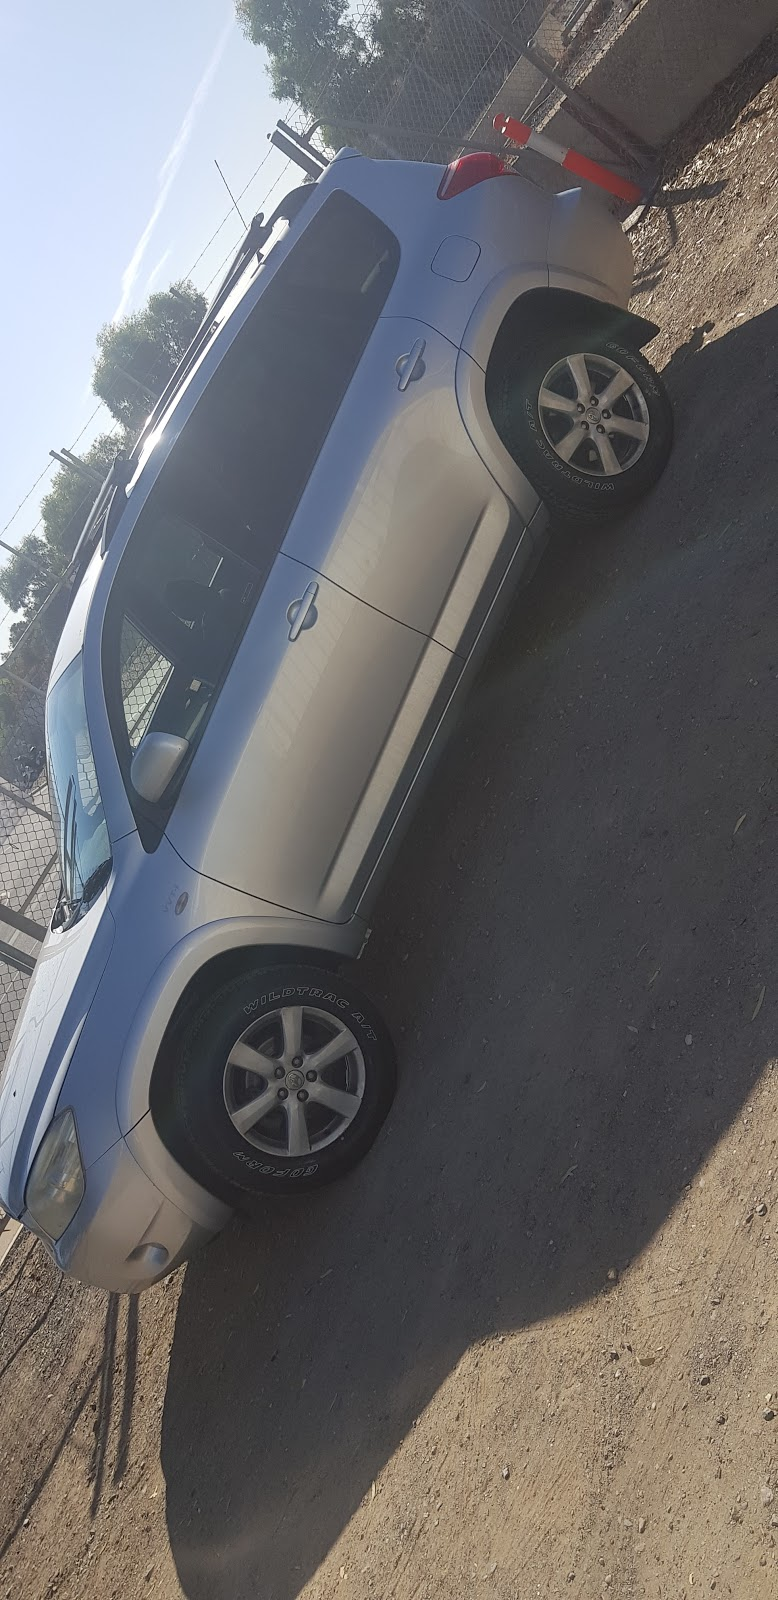 Scotts Tyres   car repair   15 Chrysler Rd, Lonsdale SA 5160, Australia   0411962842 OR +61 411 962 842